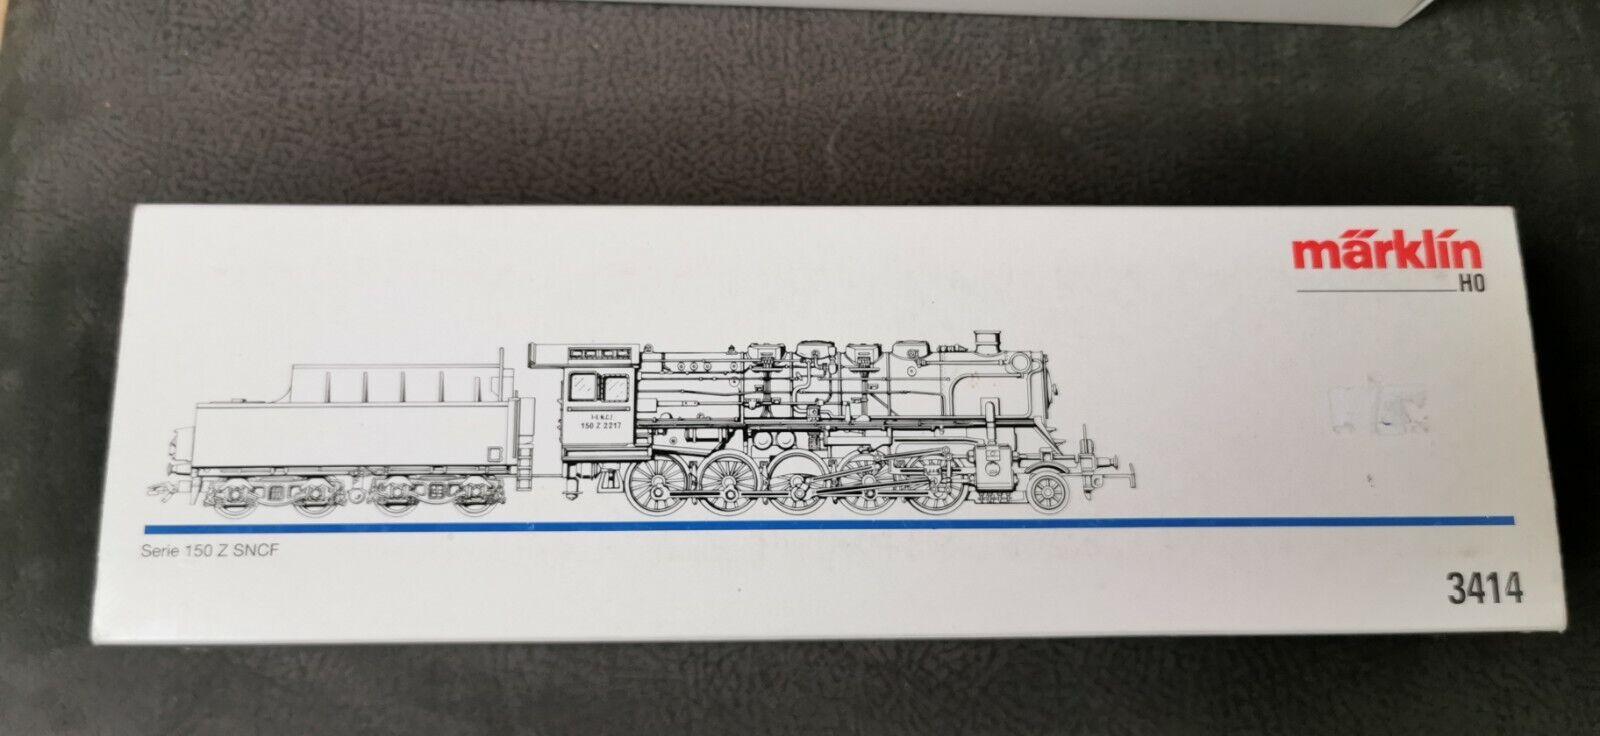 marklin HO LOK 3414 serie 150 SNCF t2527